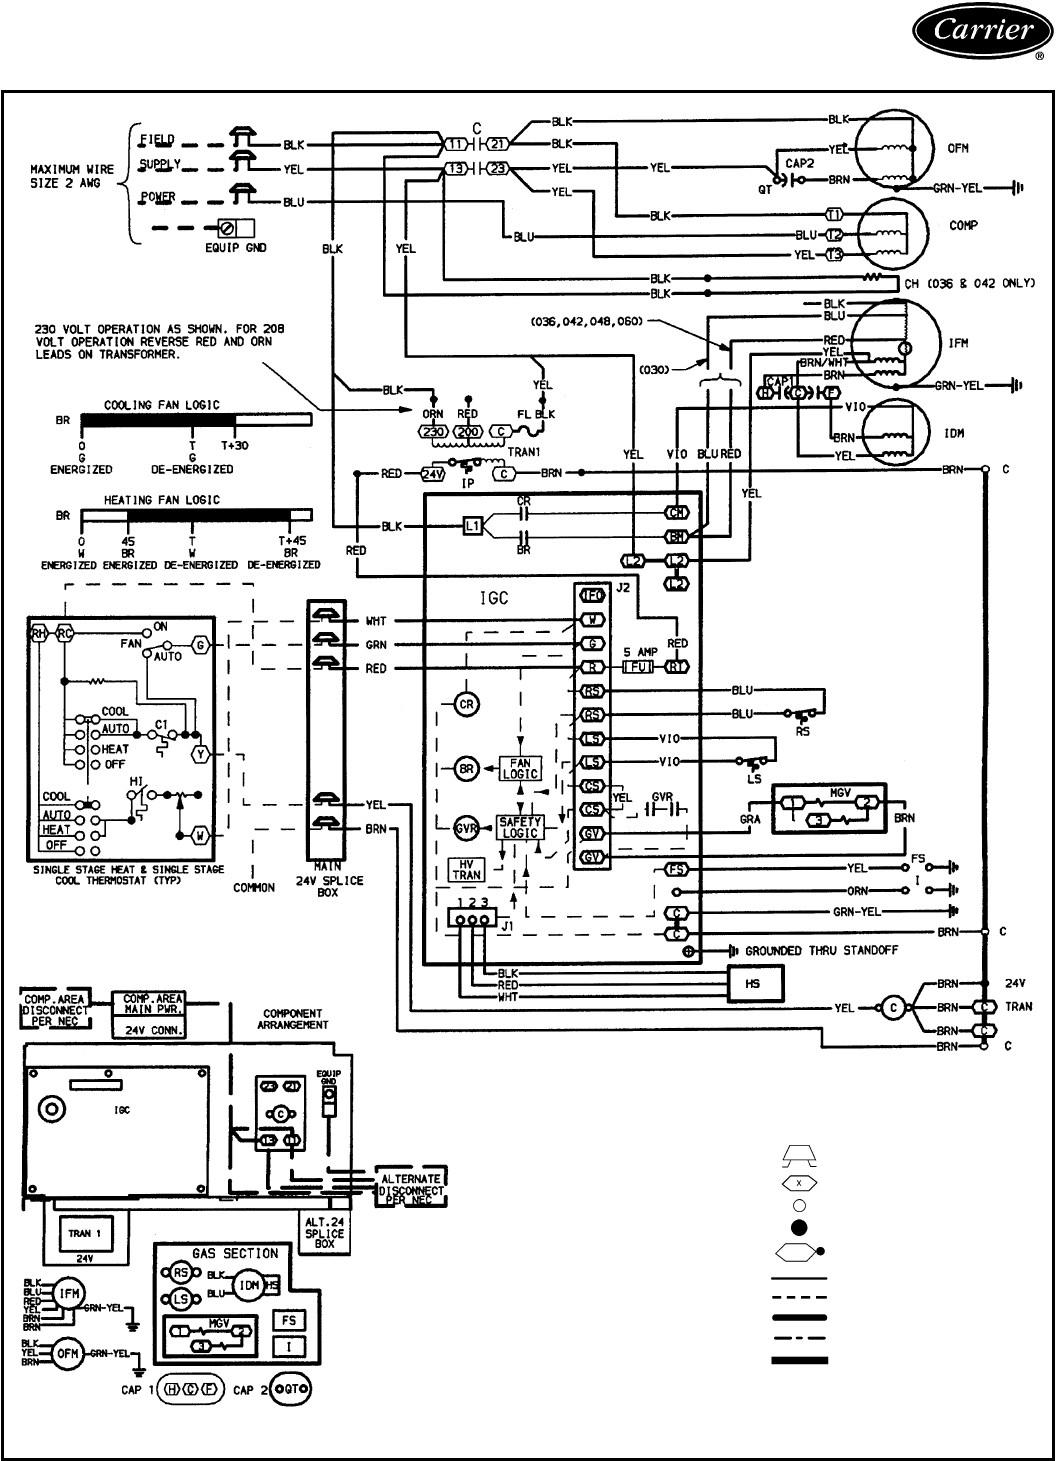 Power Acoustik Wiring Diagram | Manual E-Books - Power Acoustik Pdn-626B Wiring Diagram